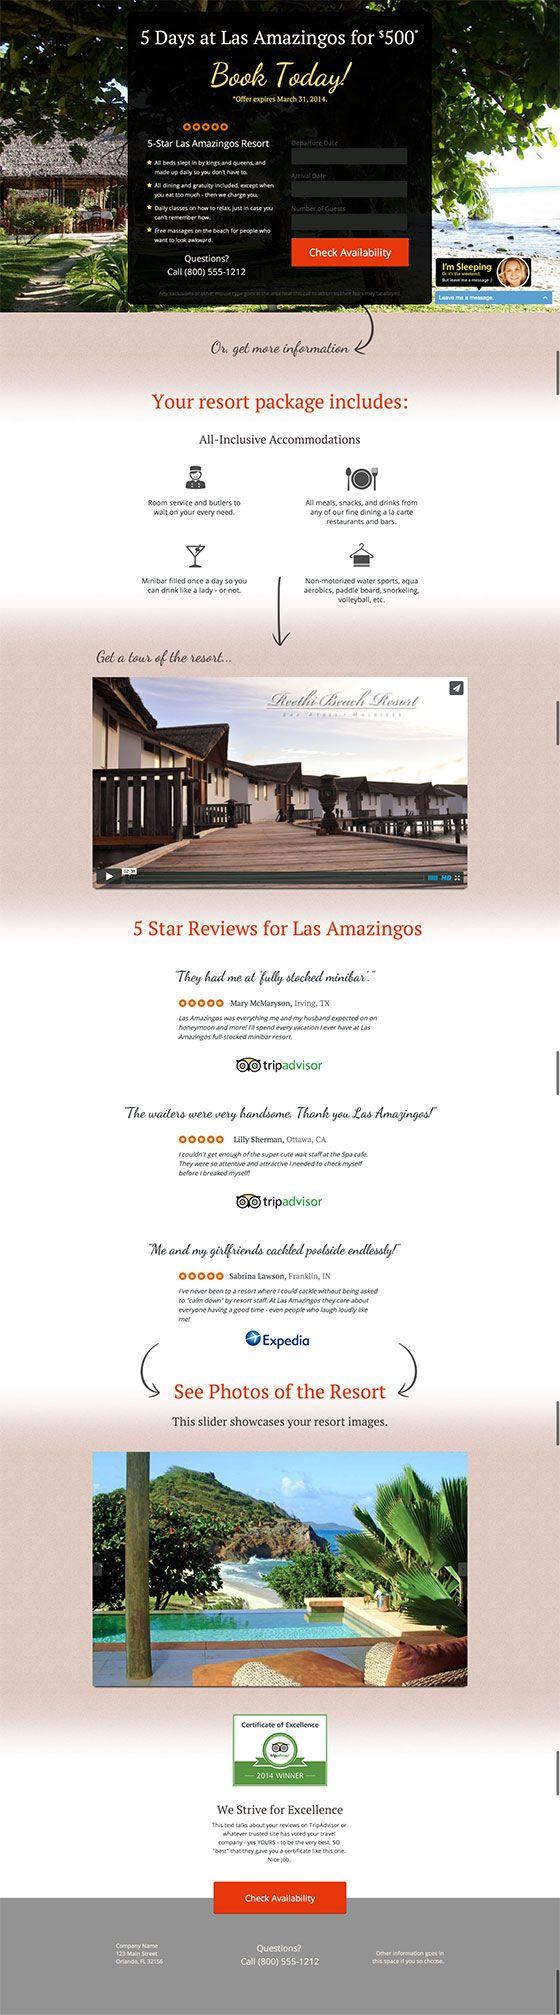 Convert Travel Landing Page Lead Form - Unbounce Conversion Centered Design Template Contest Winner